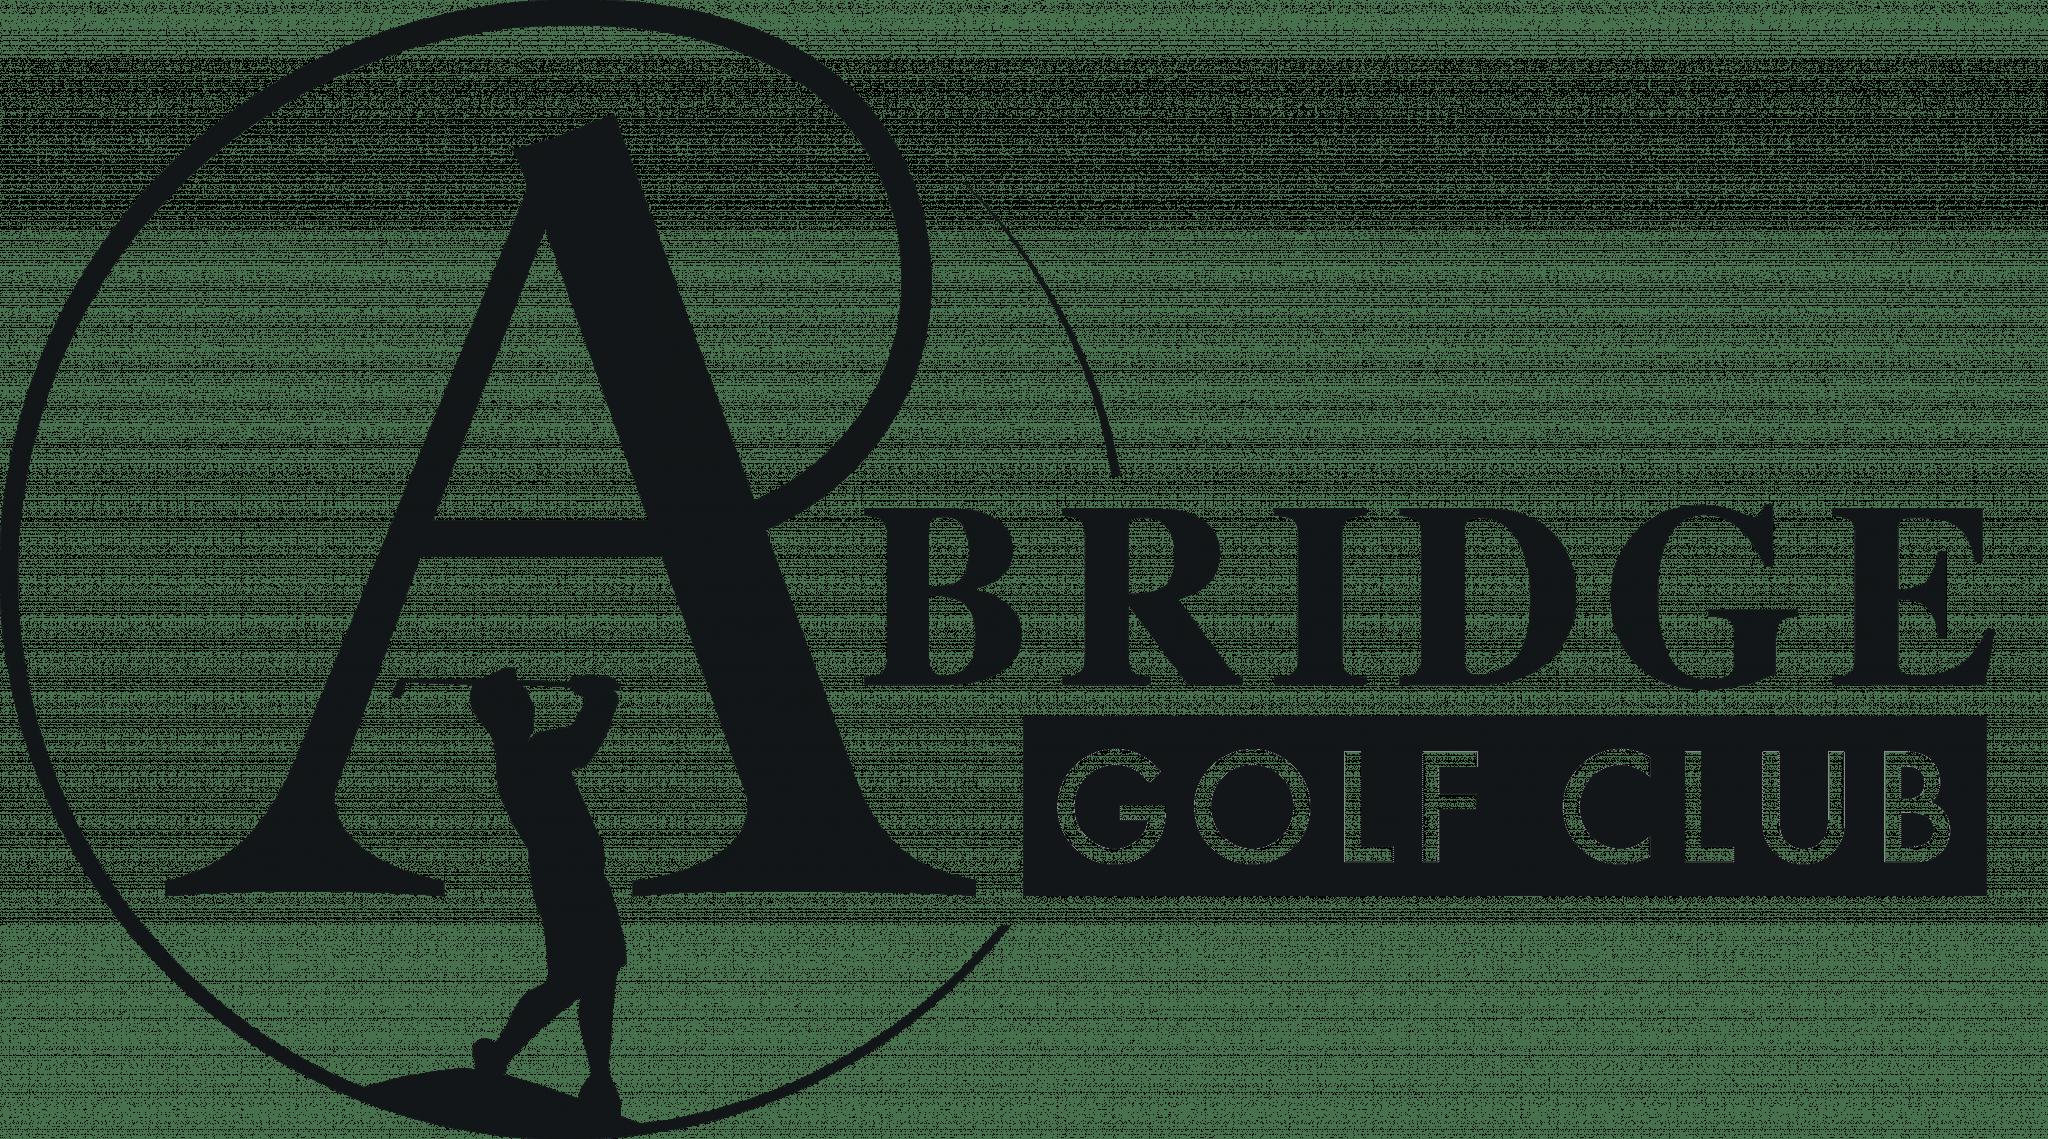 Abridge Golf Club | Golf Course in Essex